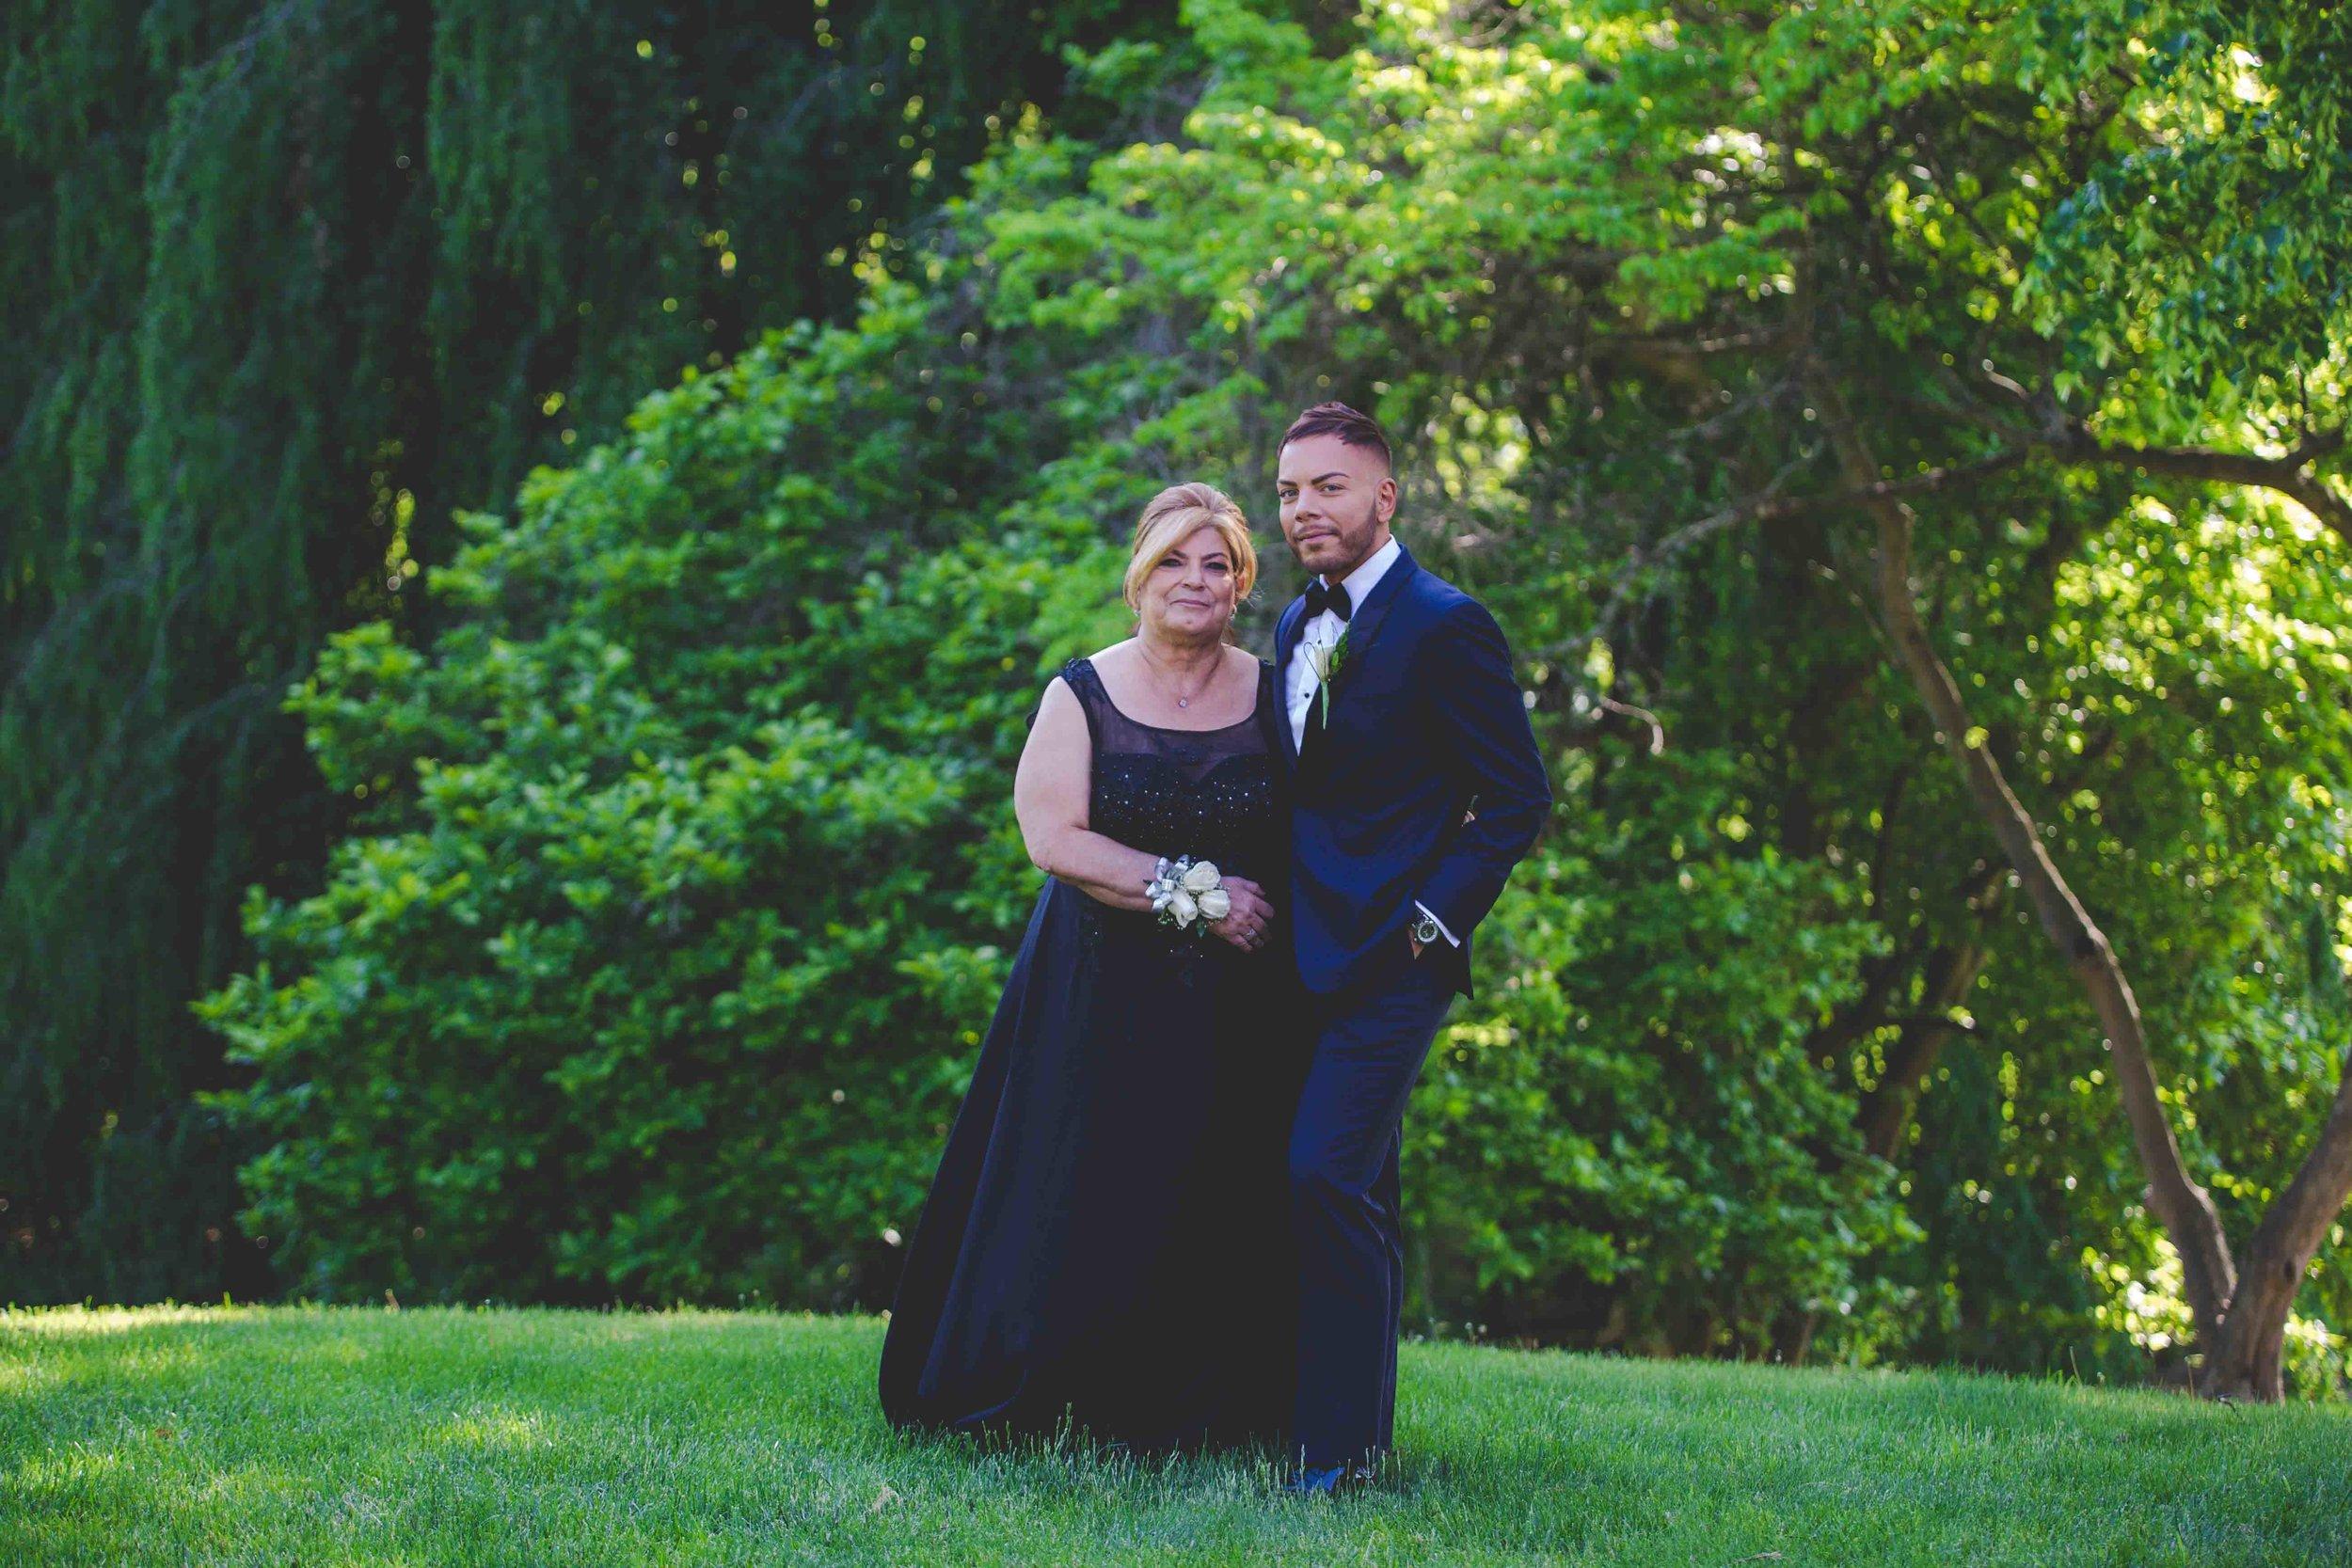 lyndhurst-mansion-amazing-gay-wedding-11.jpg